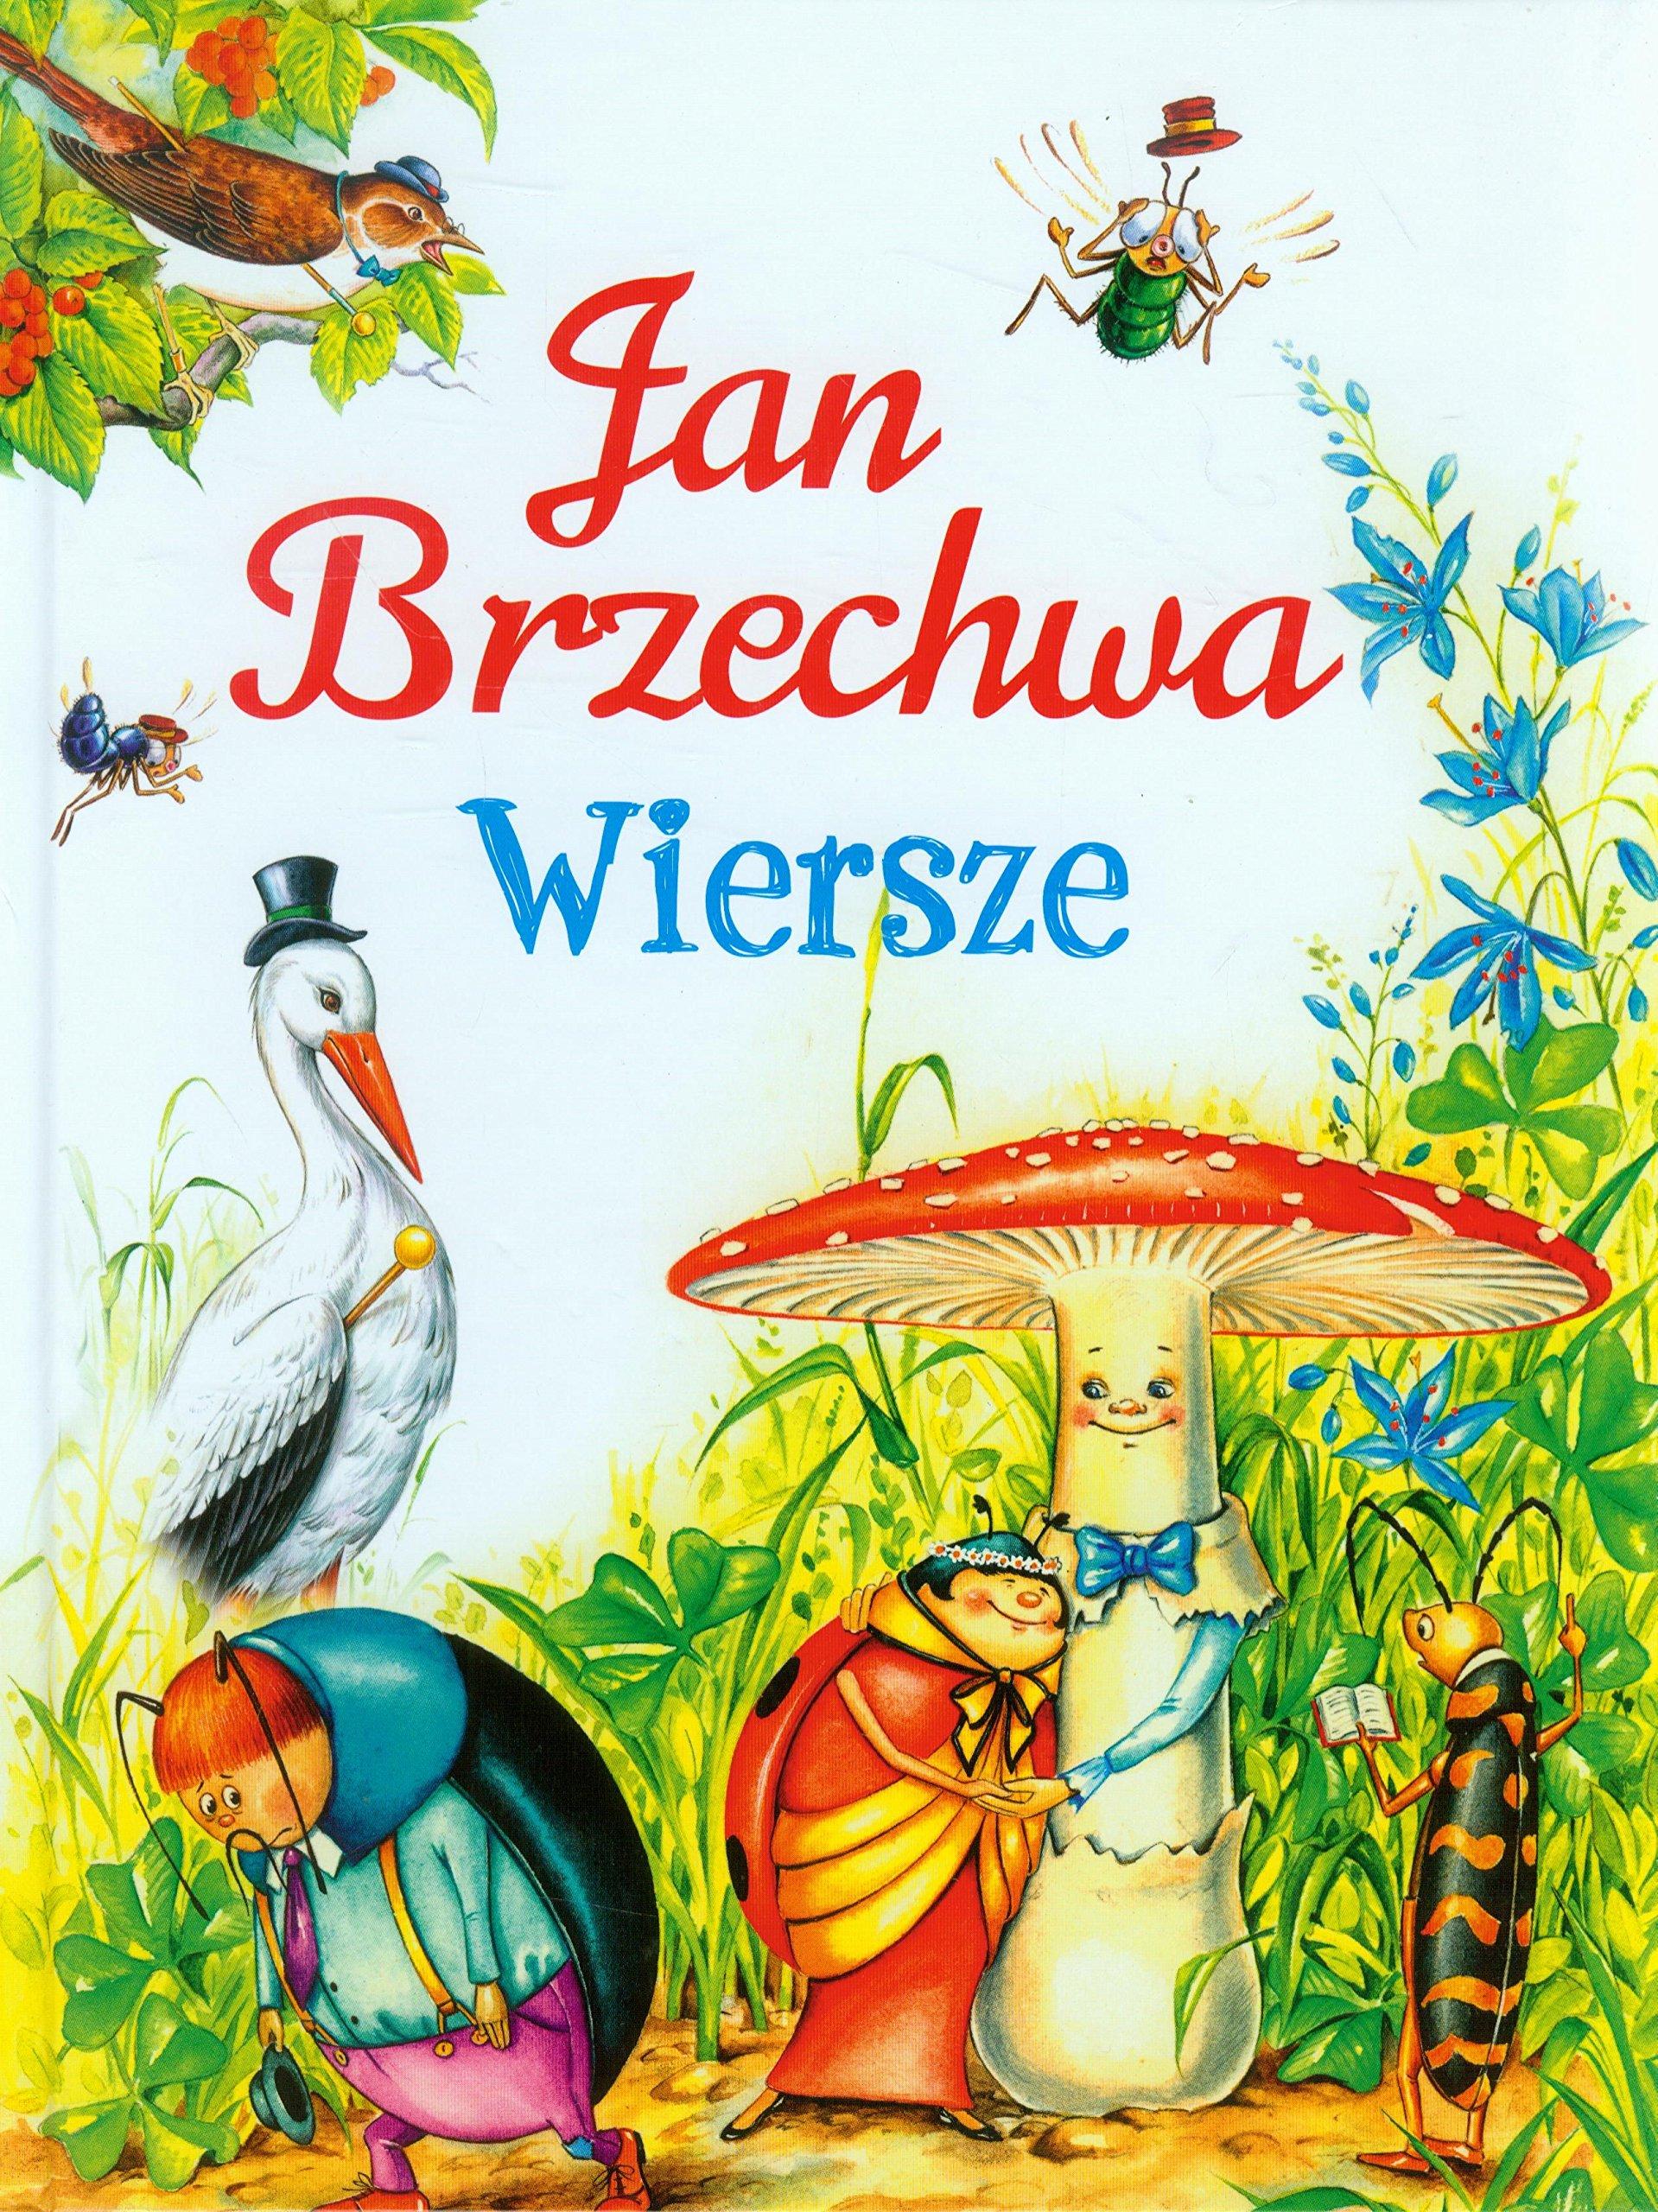 Wiersze Amazones Jan Brzechwa Libros En Idiomas Extranjeros